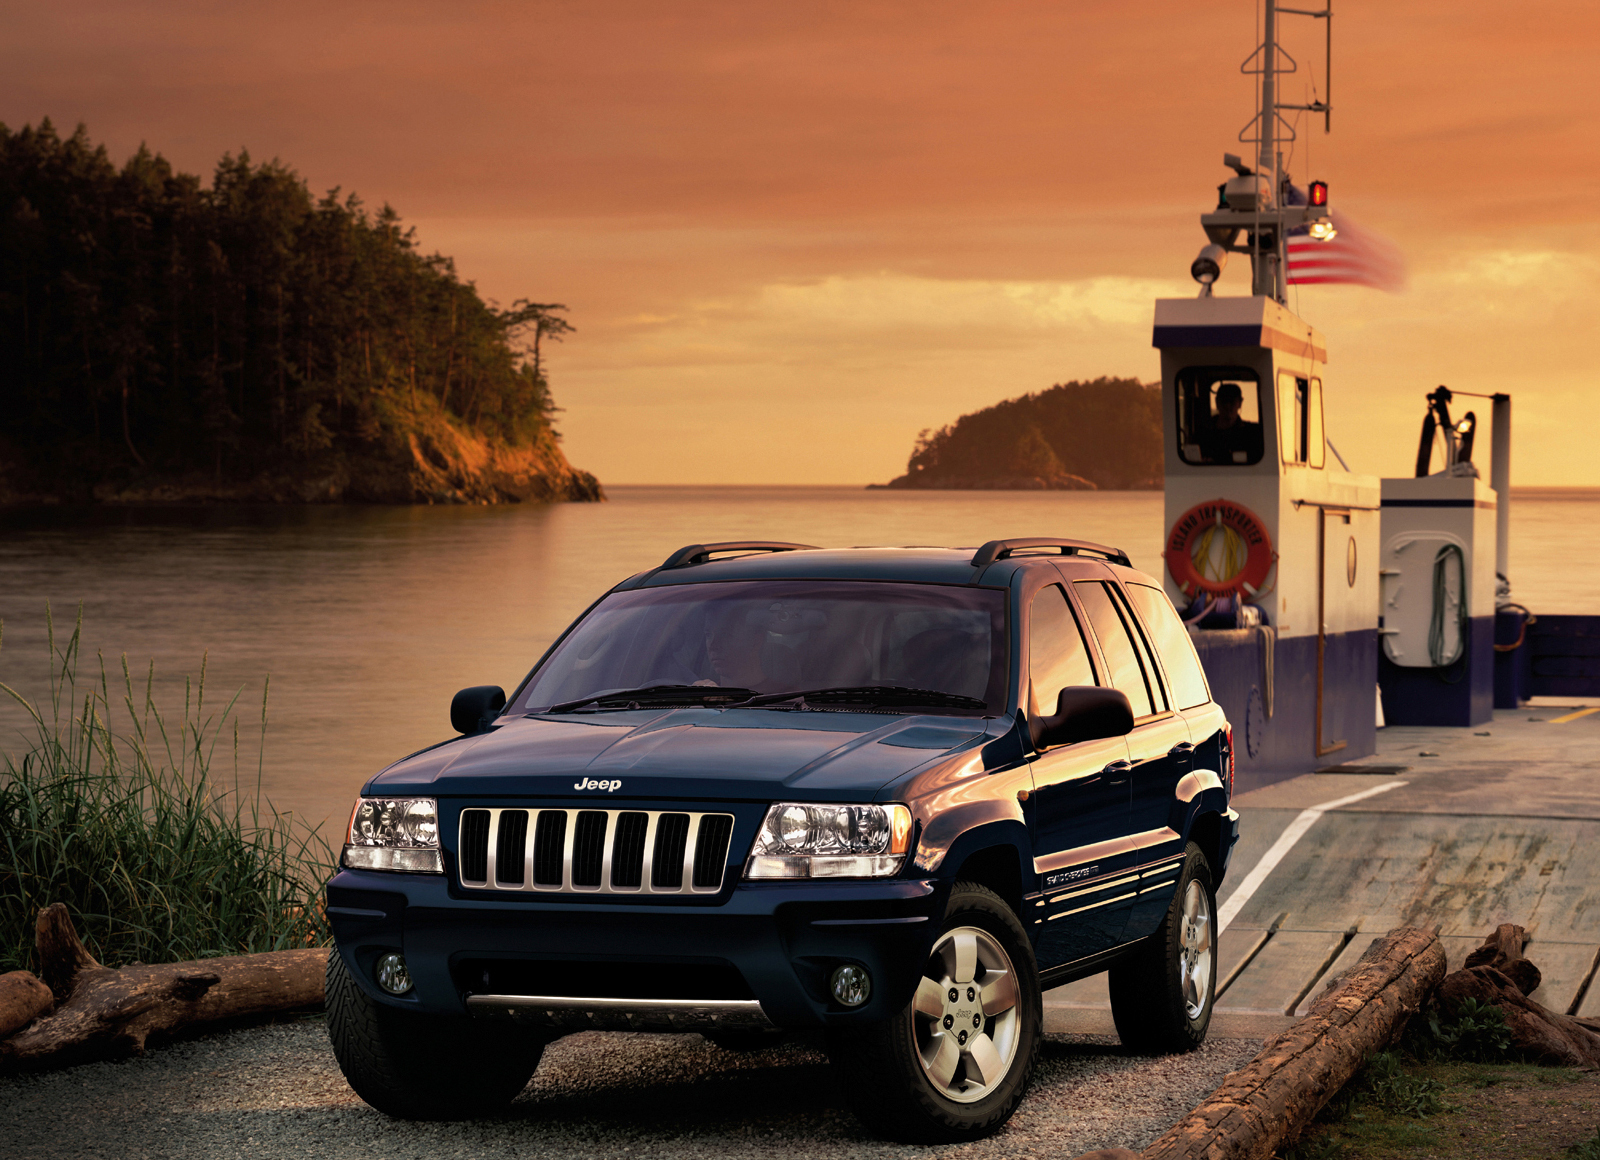 2003 jeep grand cherokee wallpaper